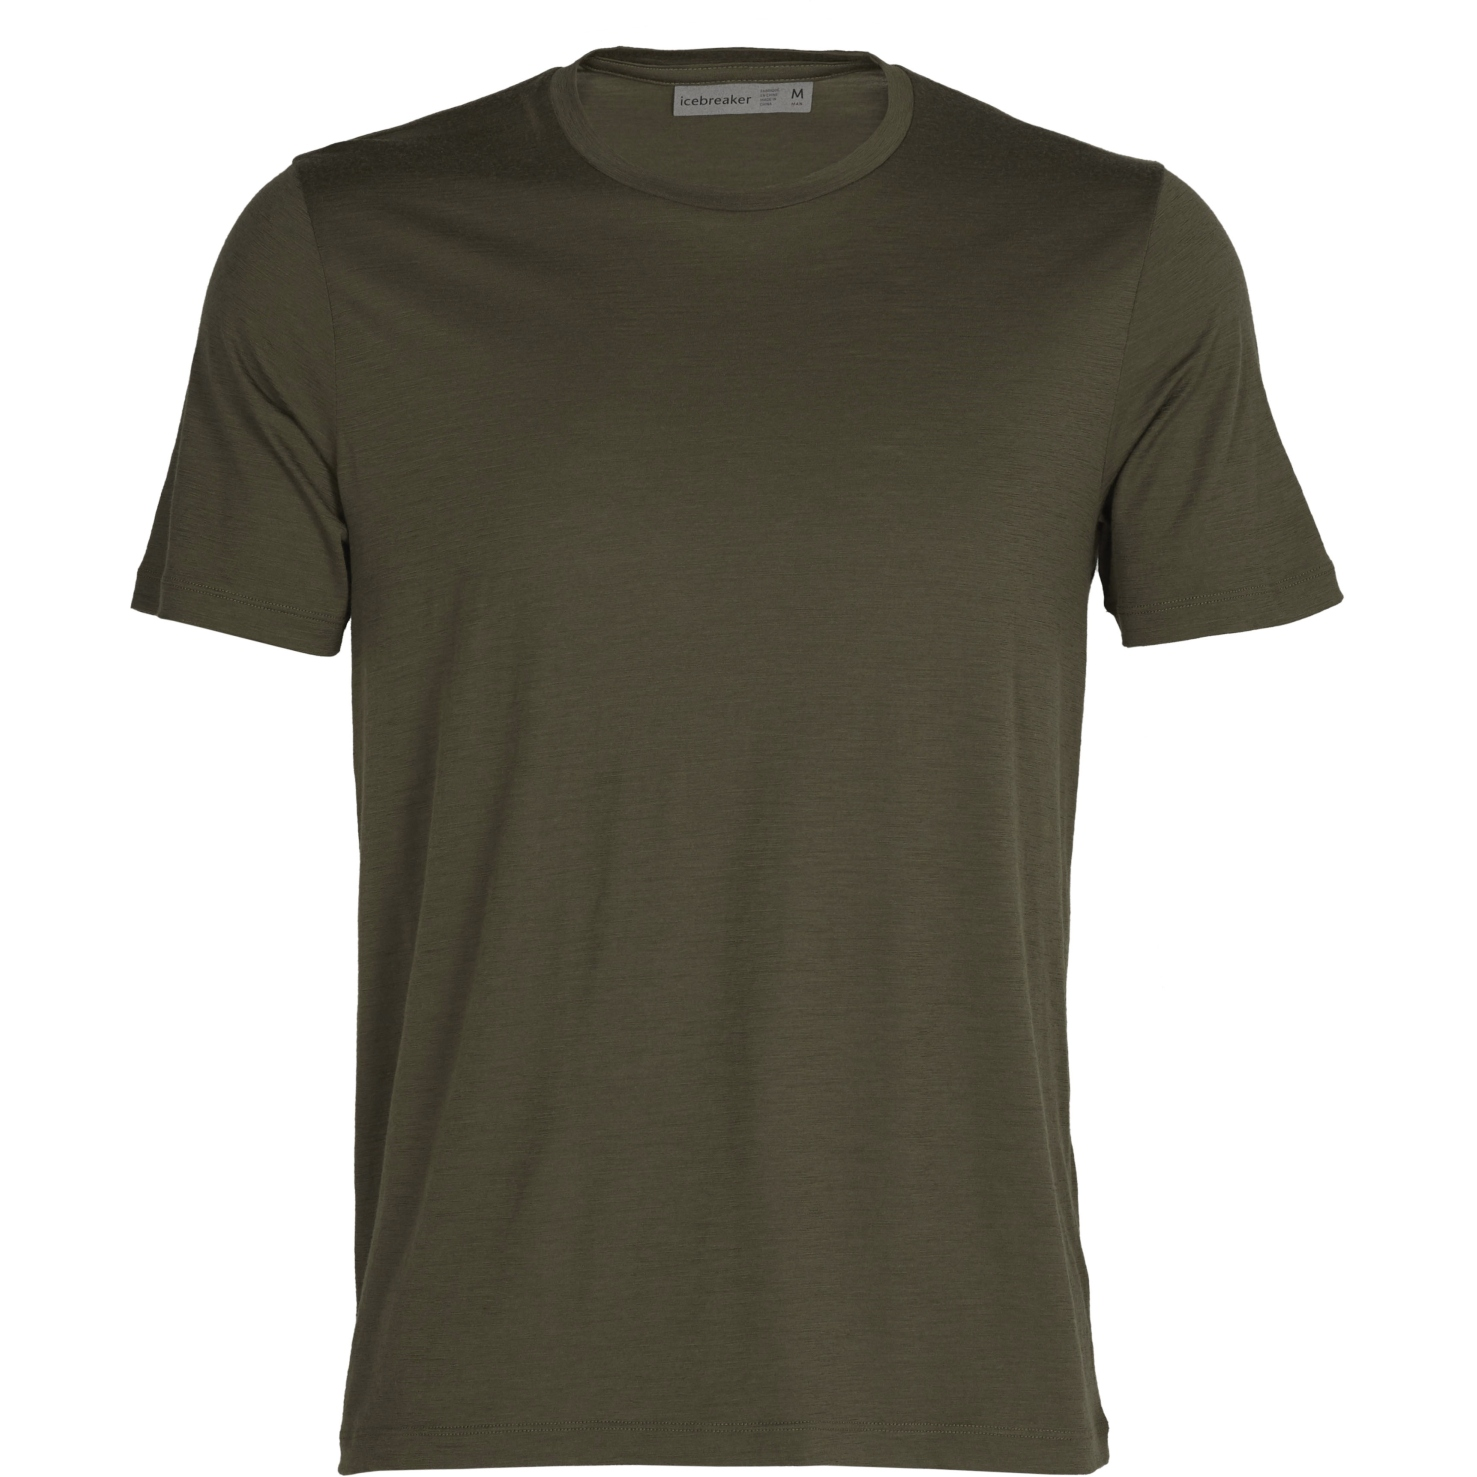 Icebreaker Tech Lite II Herren T-Shirt - Loden